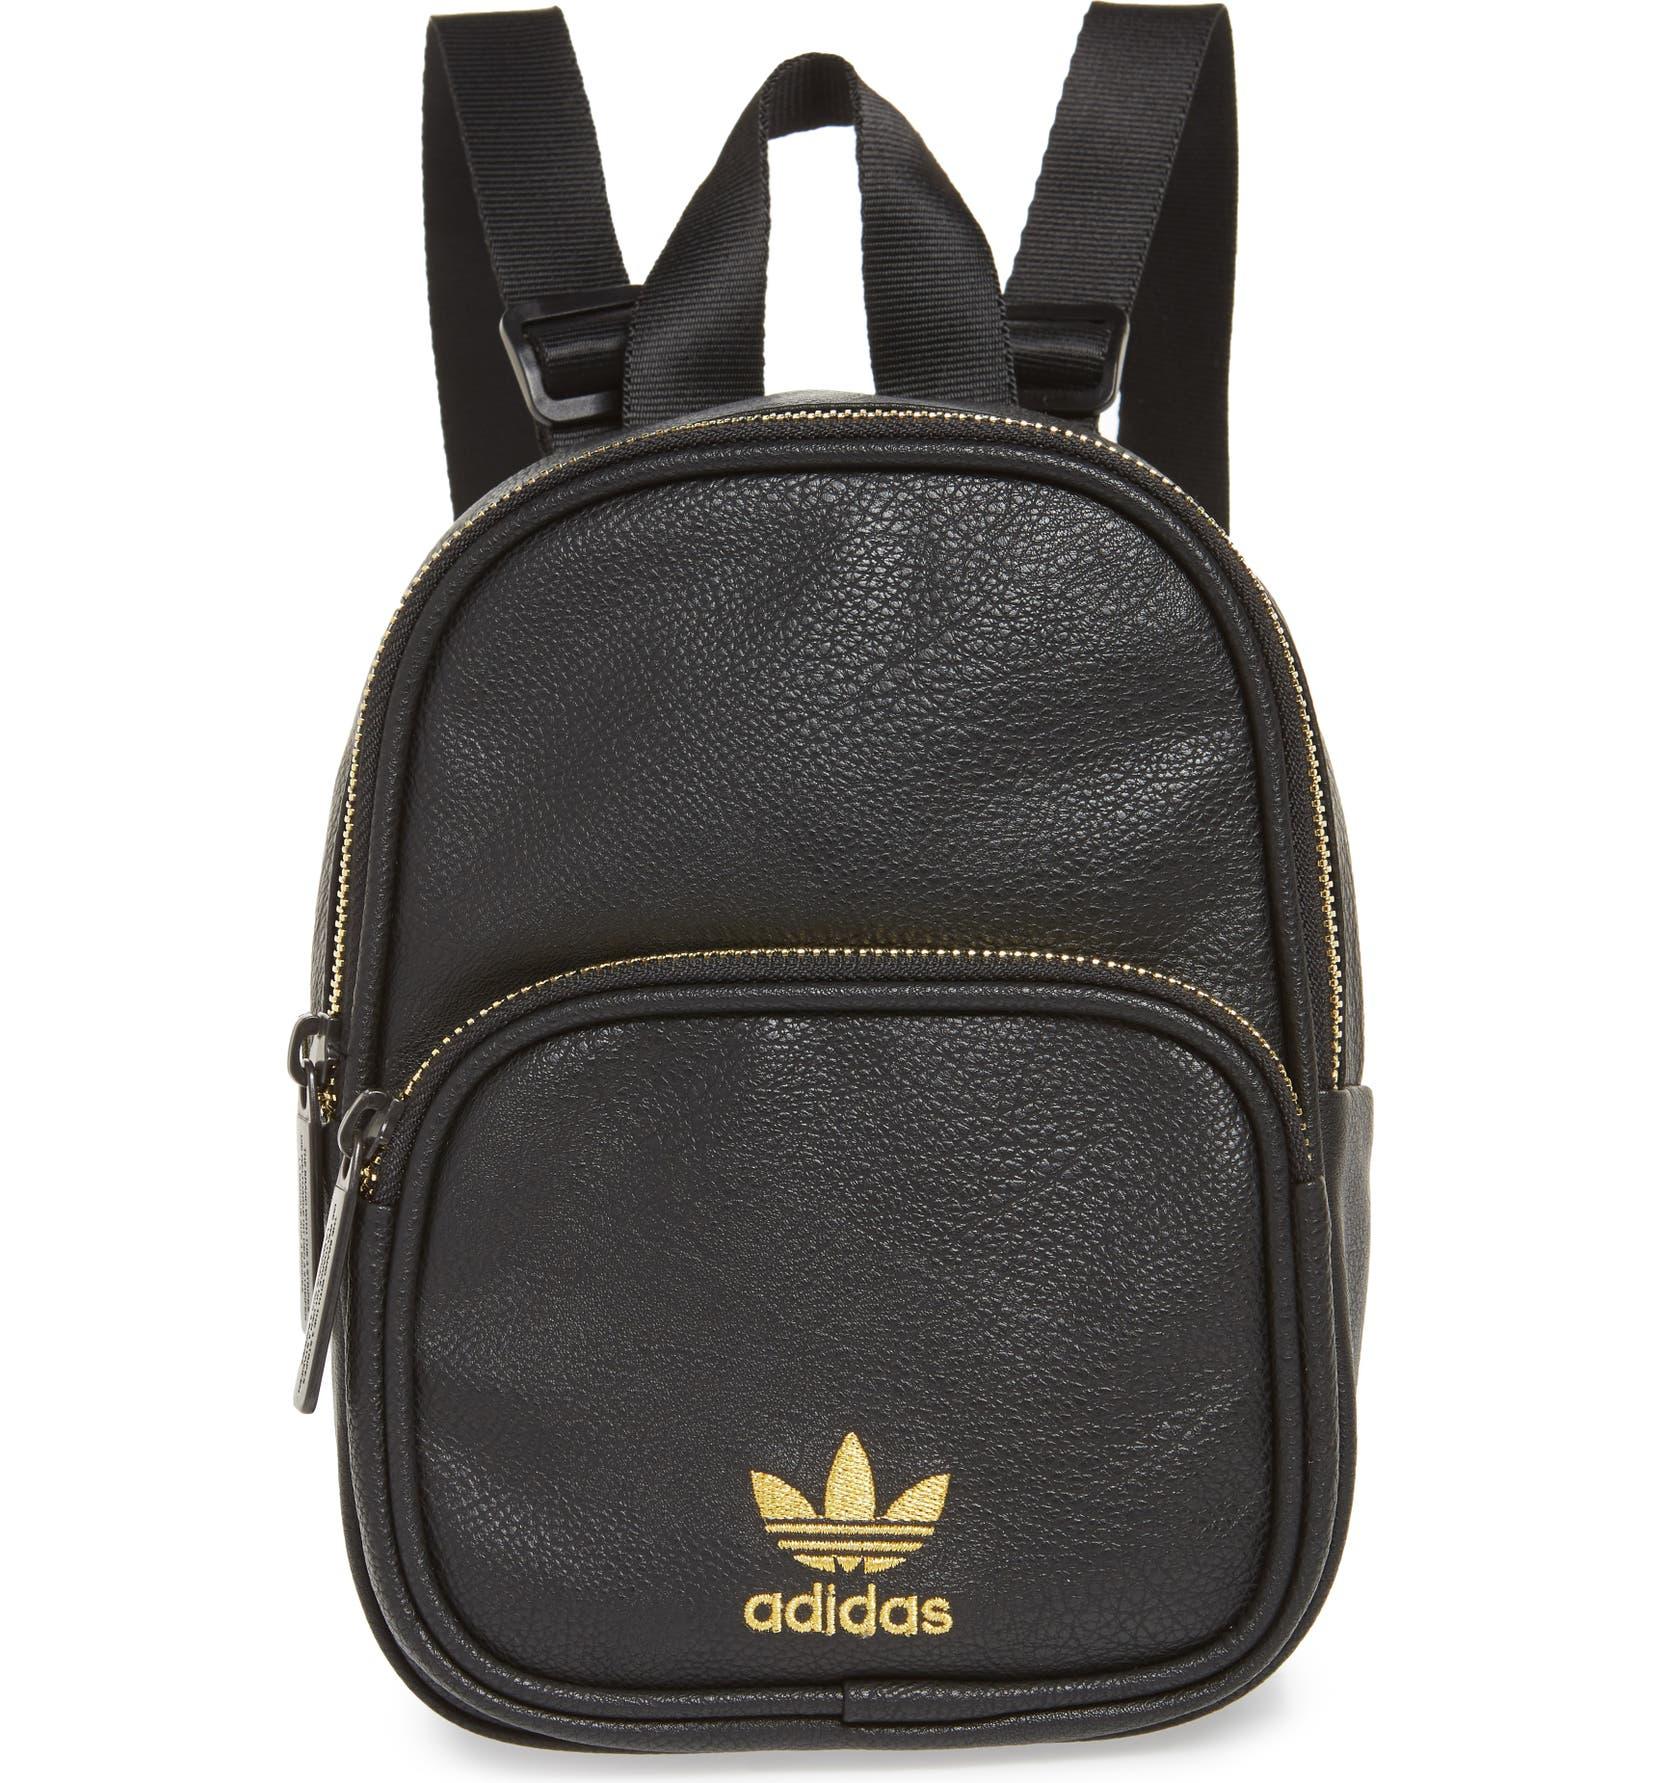 Adidas Originals Mini classic x faux leather backpack   Luisaviaroma